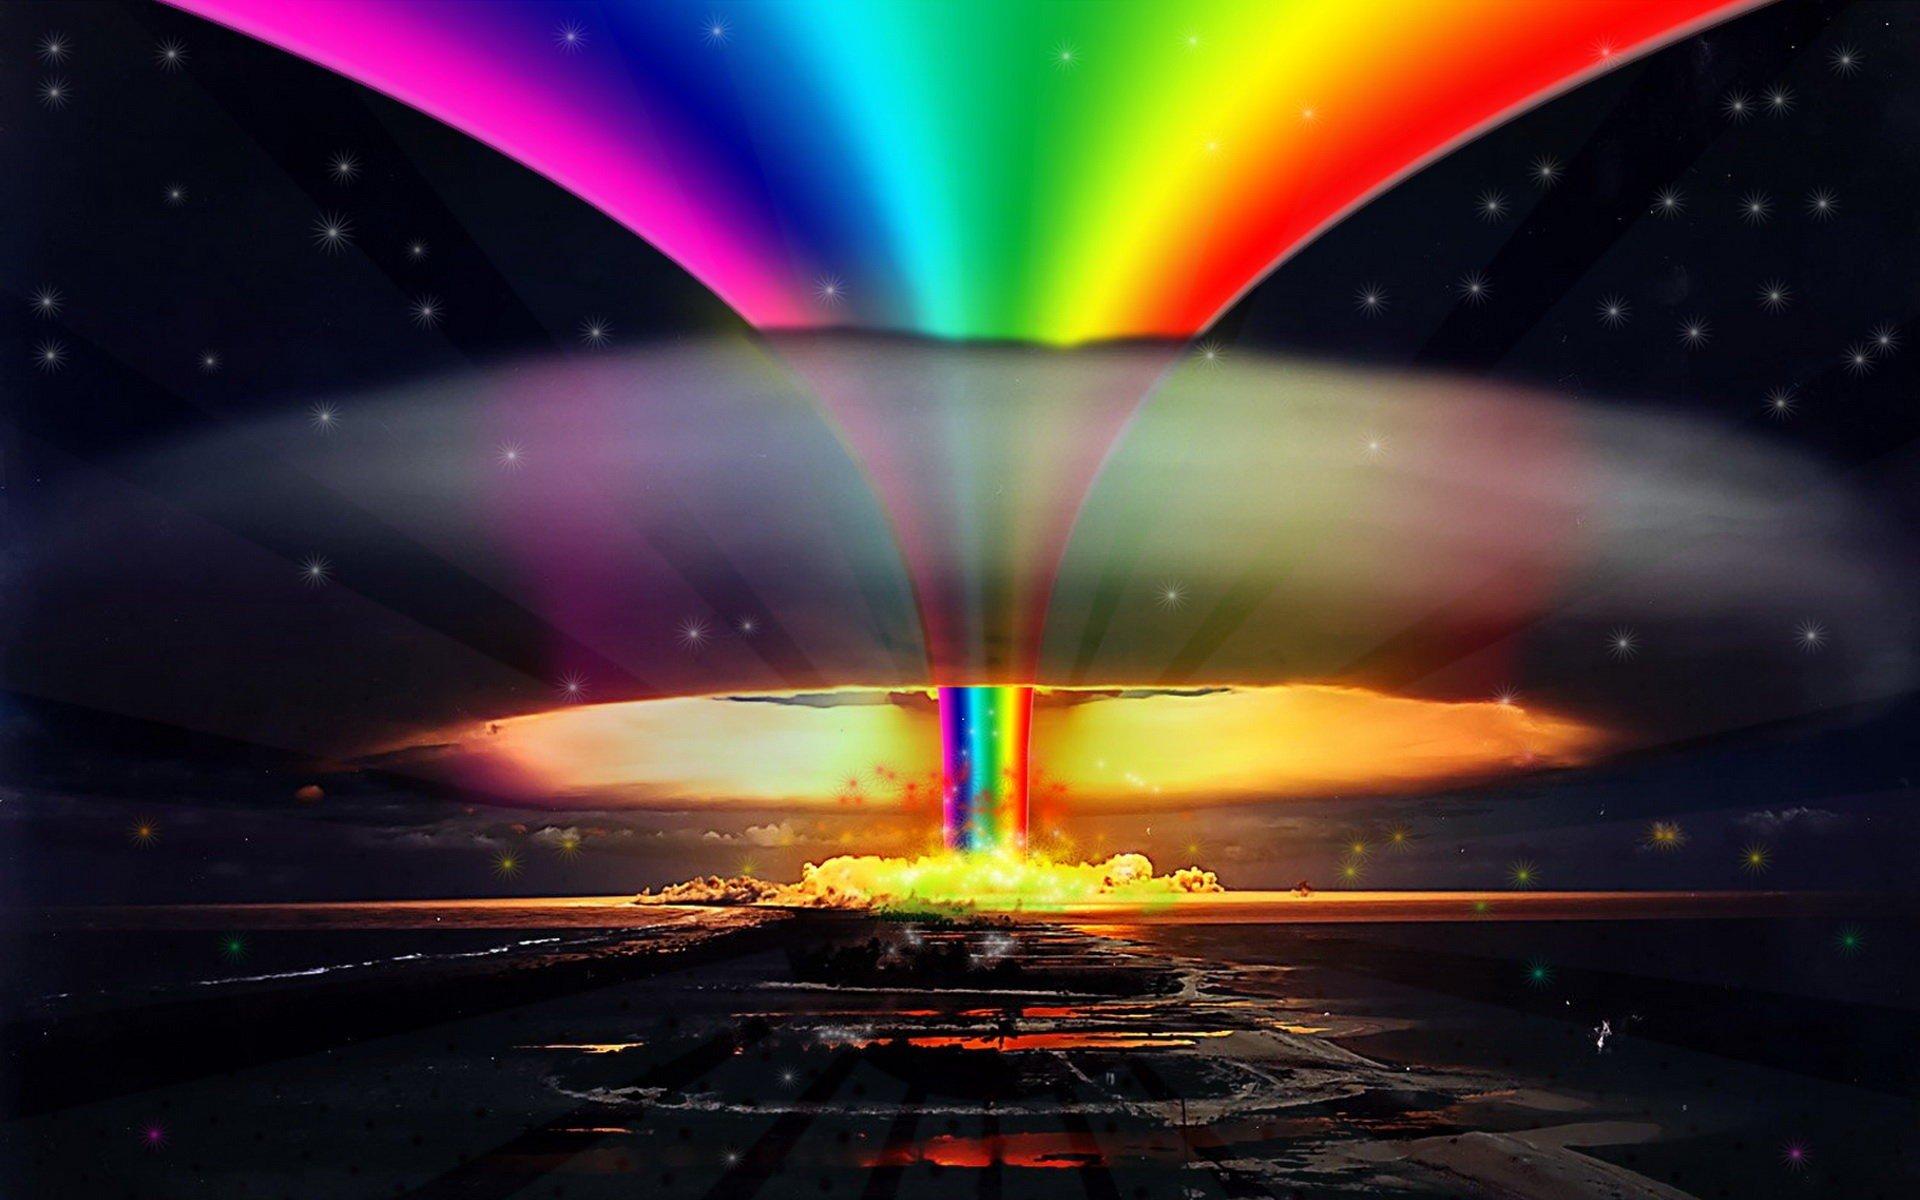 explosions pride rainbows selective coloring gay wallpaper background 1920x1200